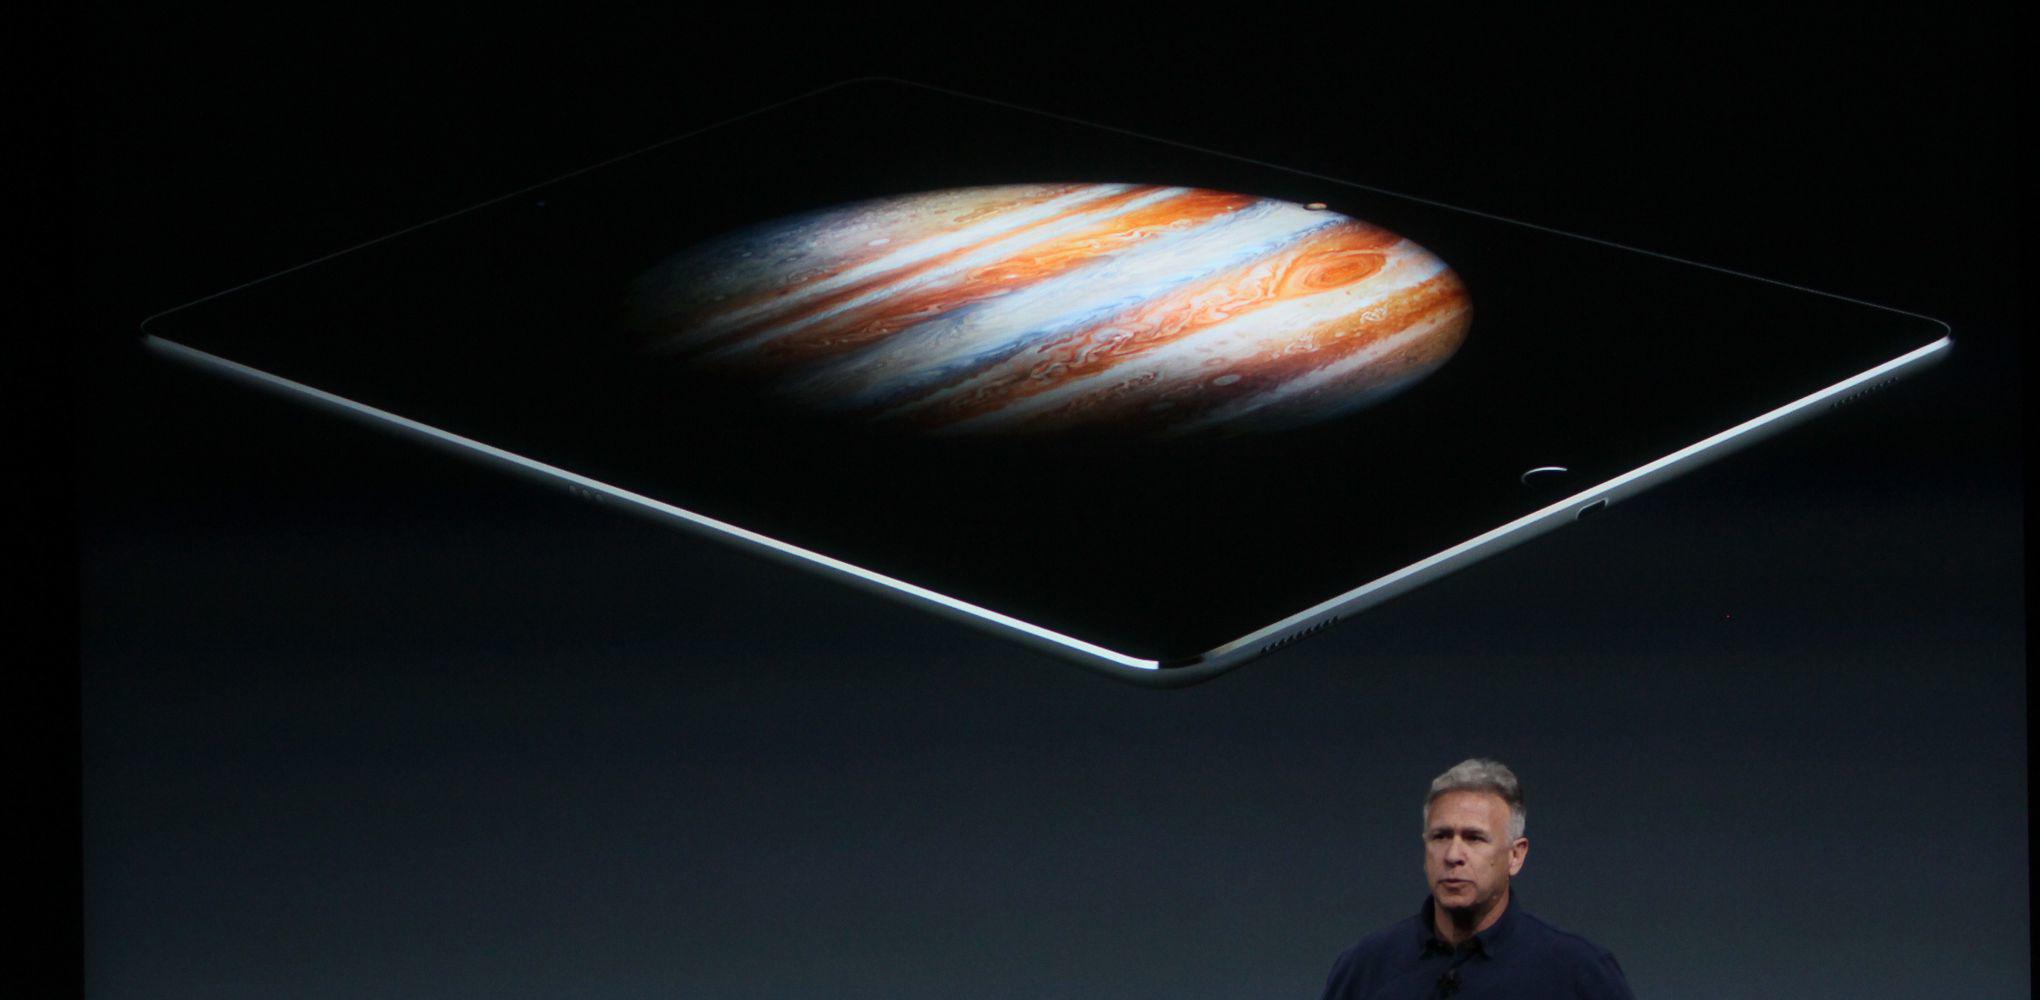 apple-iphone-se-ipad-pro-event-verge-396